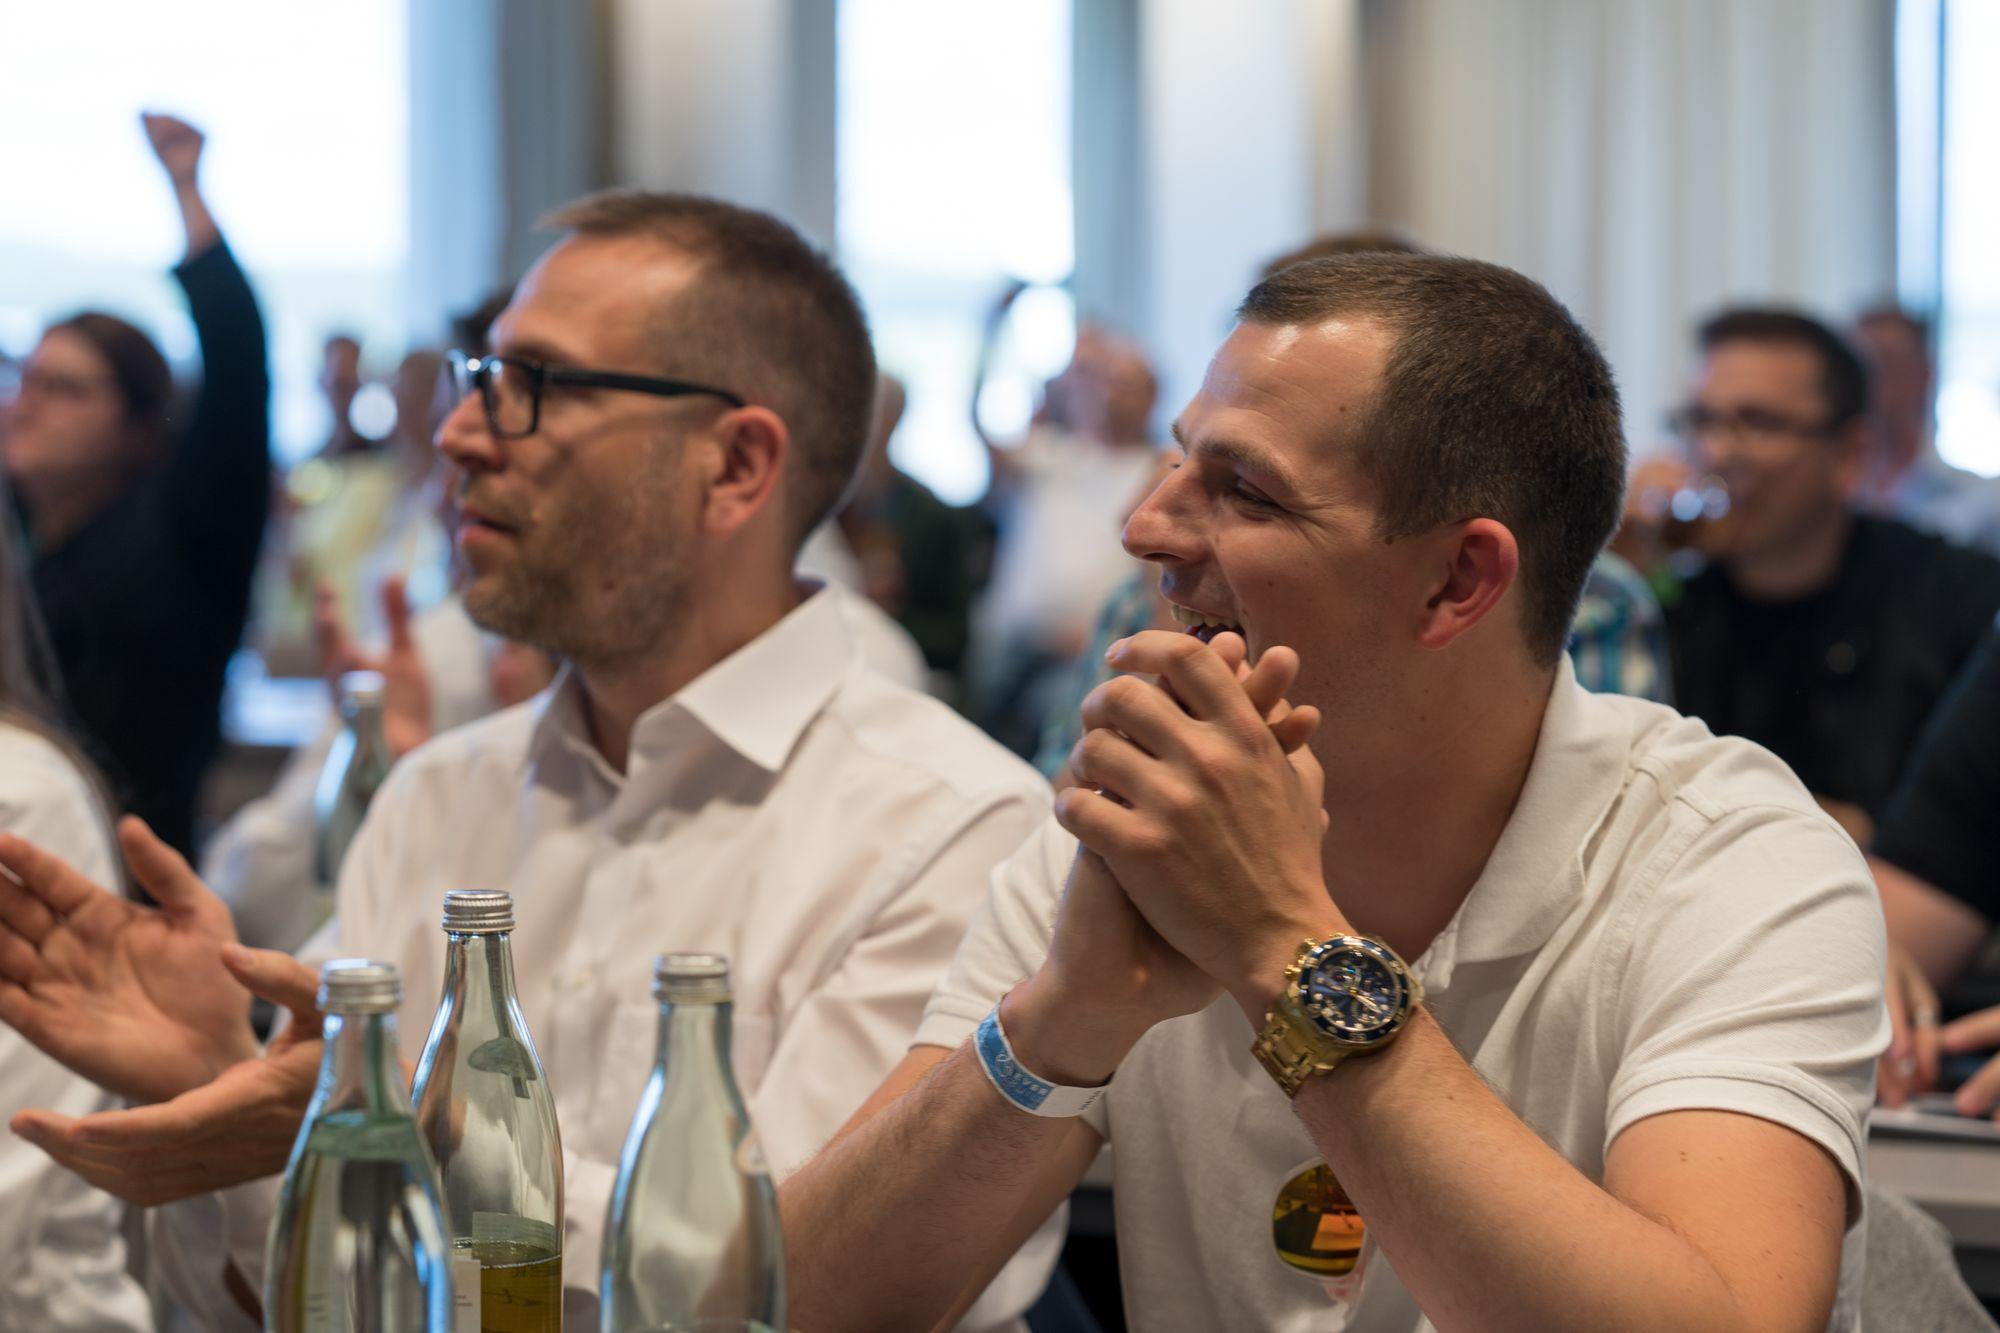 Klaus Schwarzkopf (links) im Publikum auf dem Builderall Everest 2019 in Nürnberg (Germany)